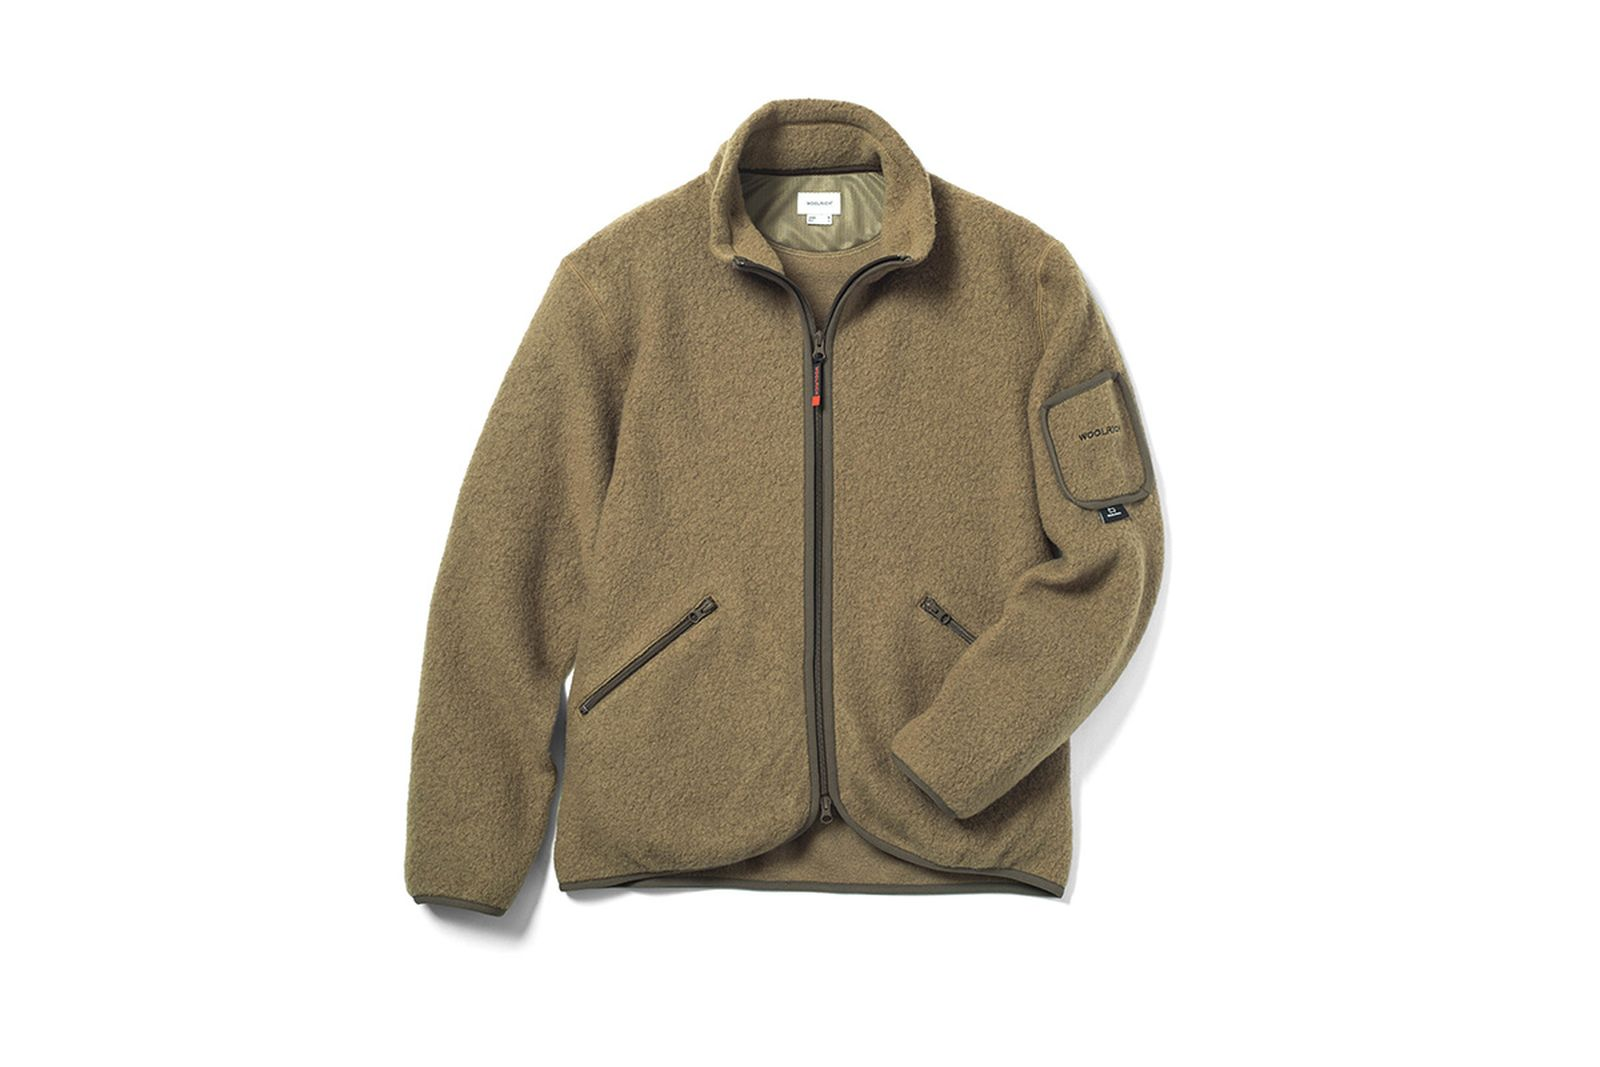 woolrich-outdoor-fallwinter-2021-collection-010